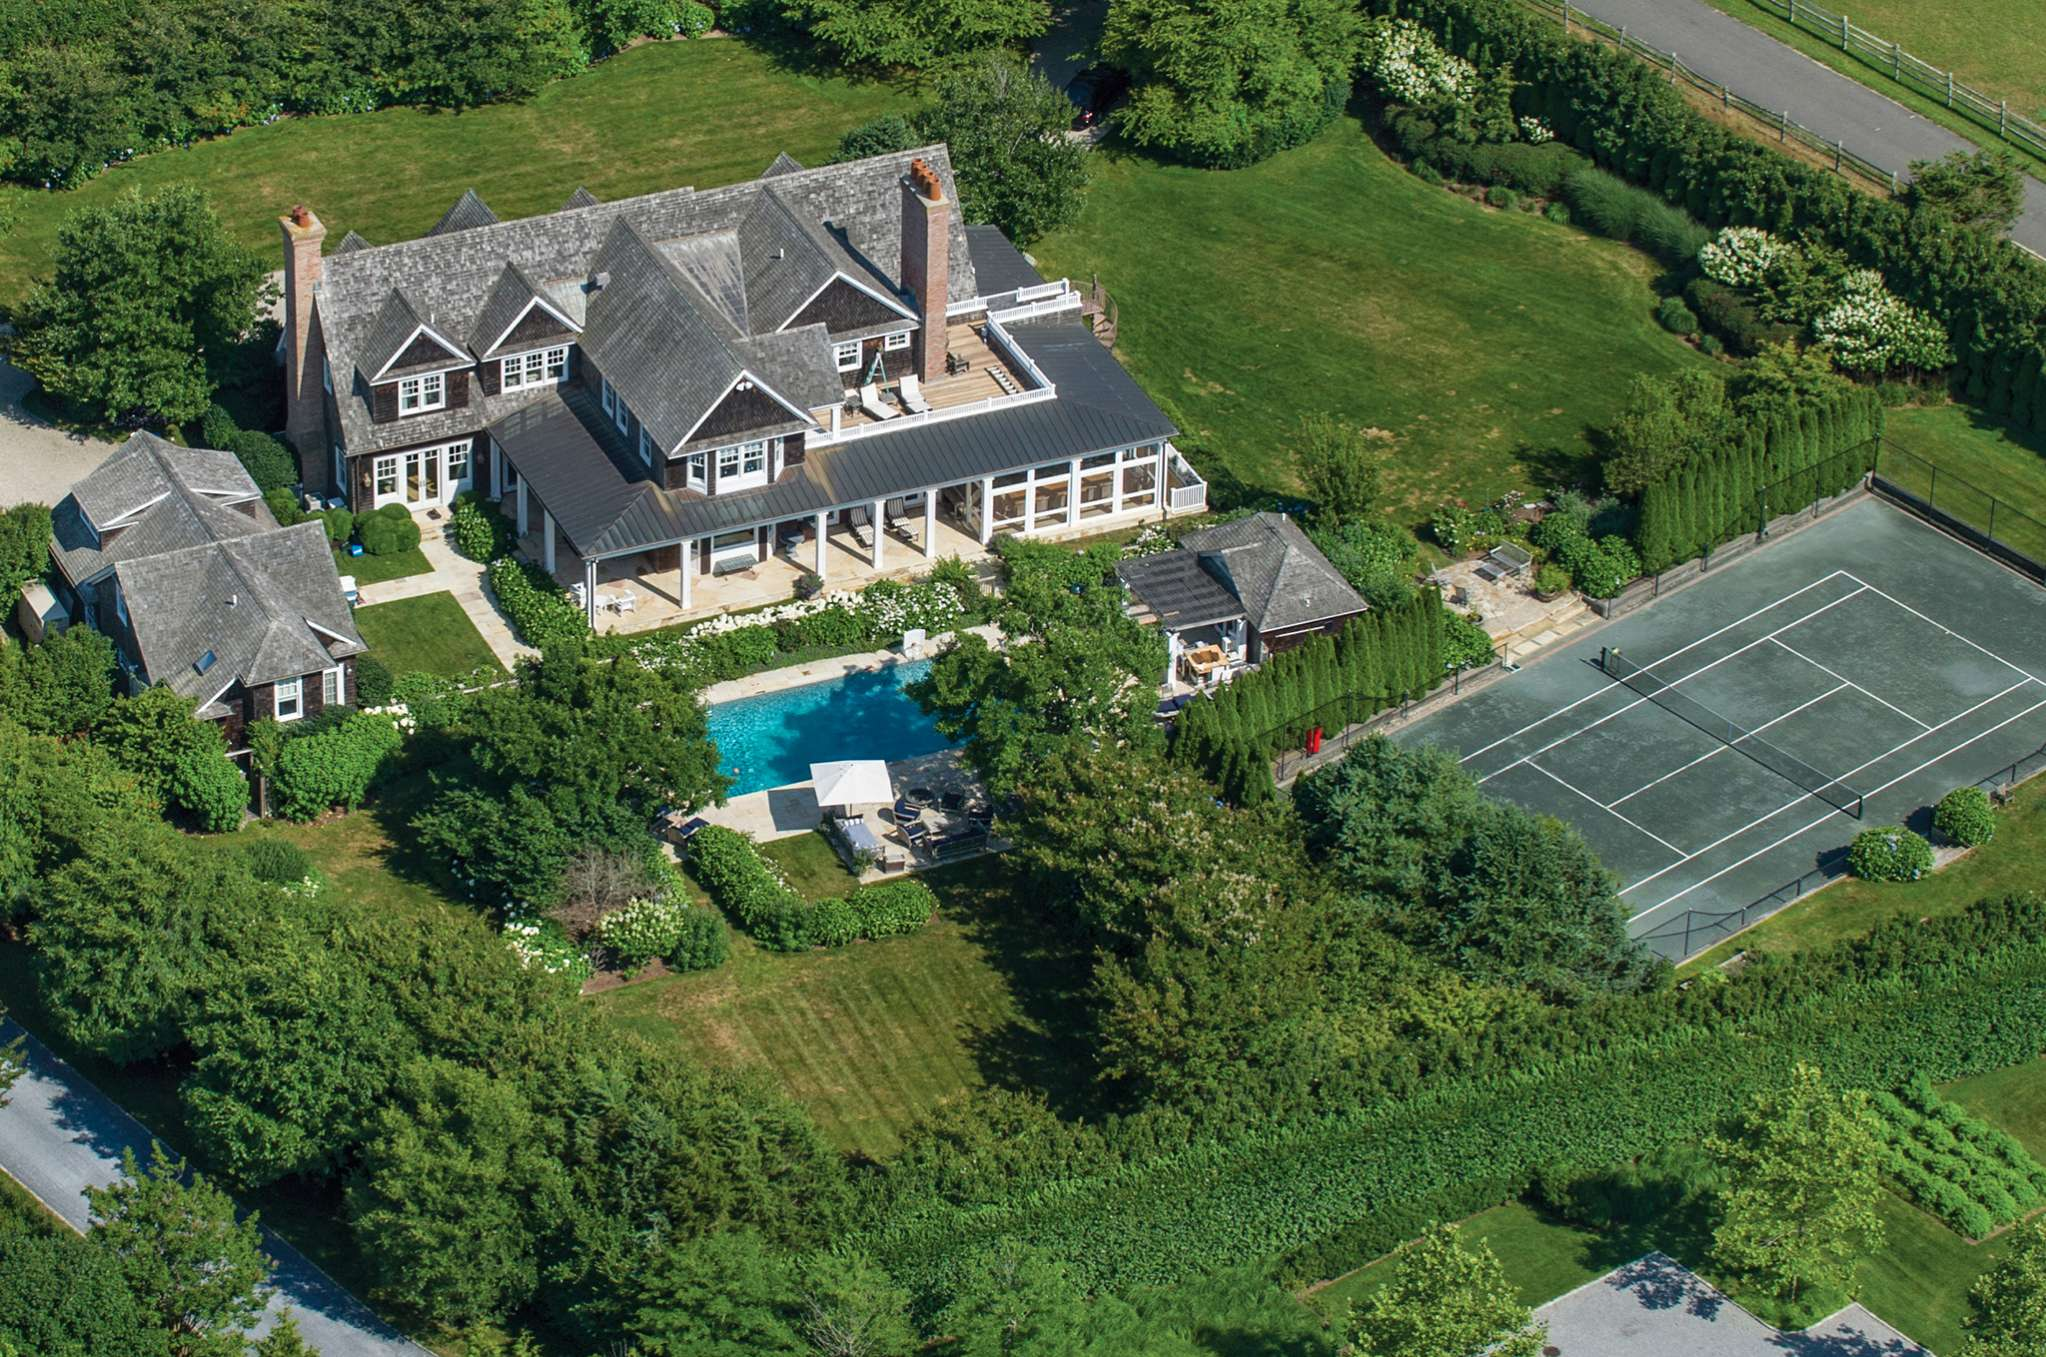 Single Family Home for Sale at Bridgehampton South With A Brand New Price 678 Halsey Lane, Bridgehampton, New York